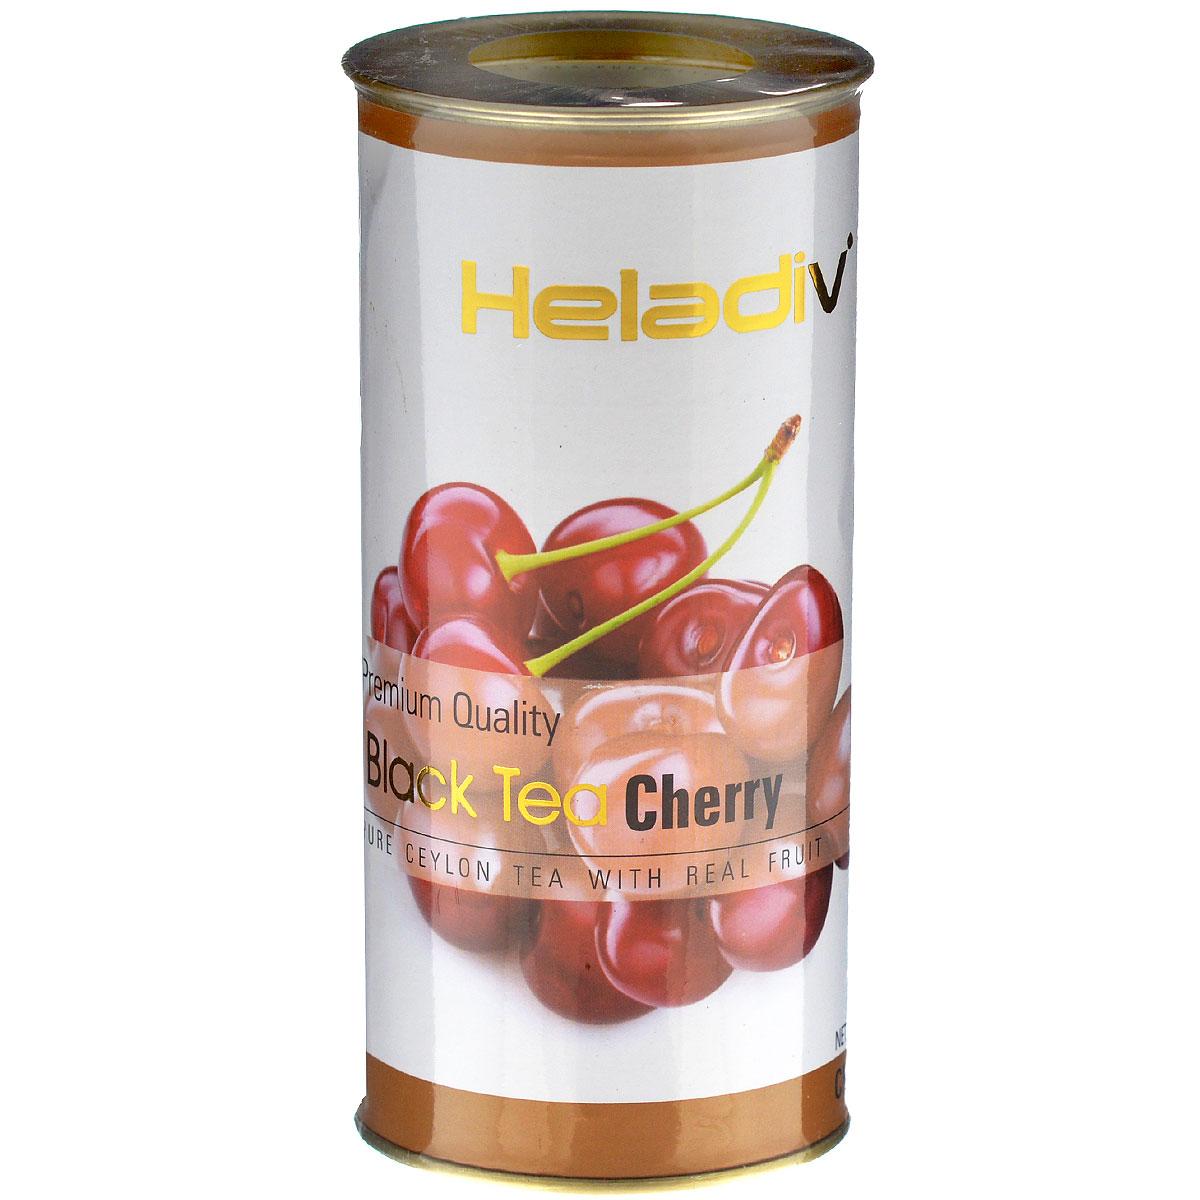 Heladiv Cherry черный фруктовый чай с вишней, 100 г heladiv opa